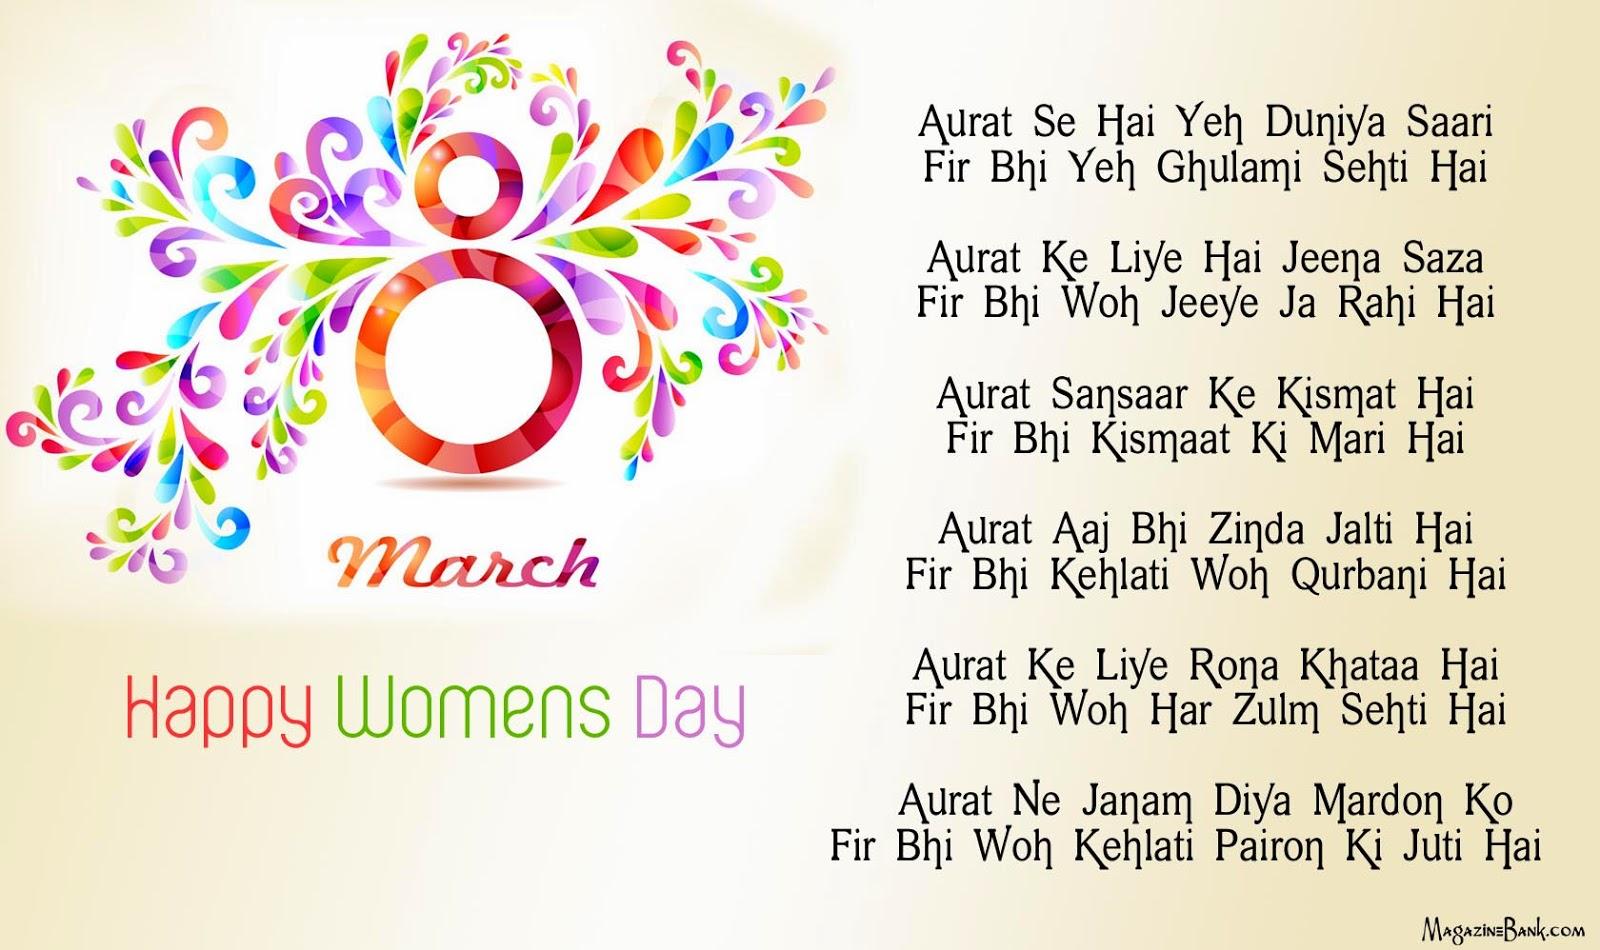 Wallpaper download jokes - Happy Birthday Hindi Sms Hindi Sms Love For Girlfriend Love Shayari Jokes Wallpaper Friend Good Morning Dosti Love Images